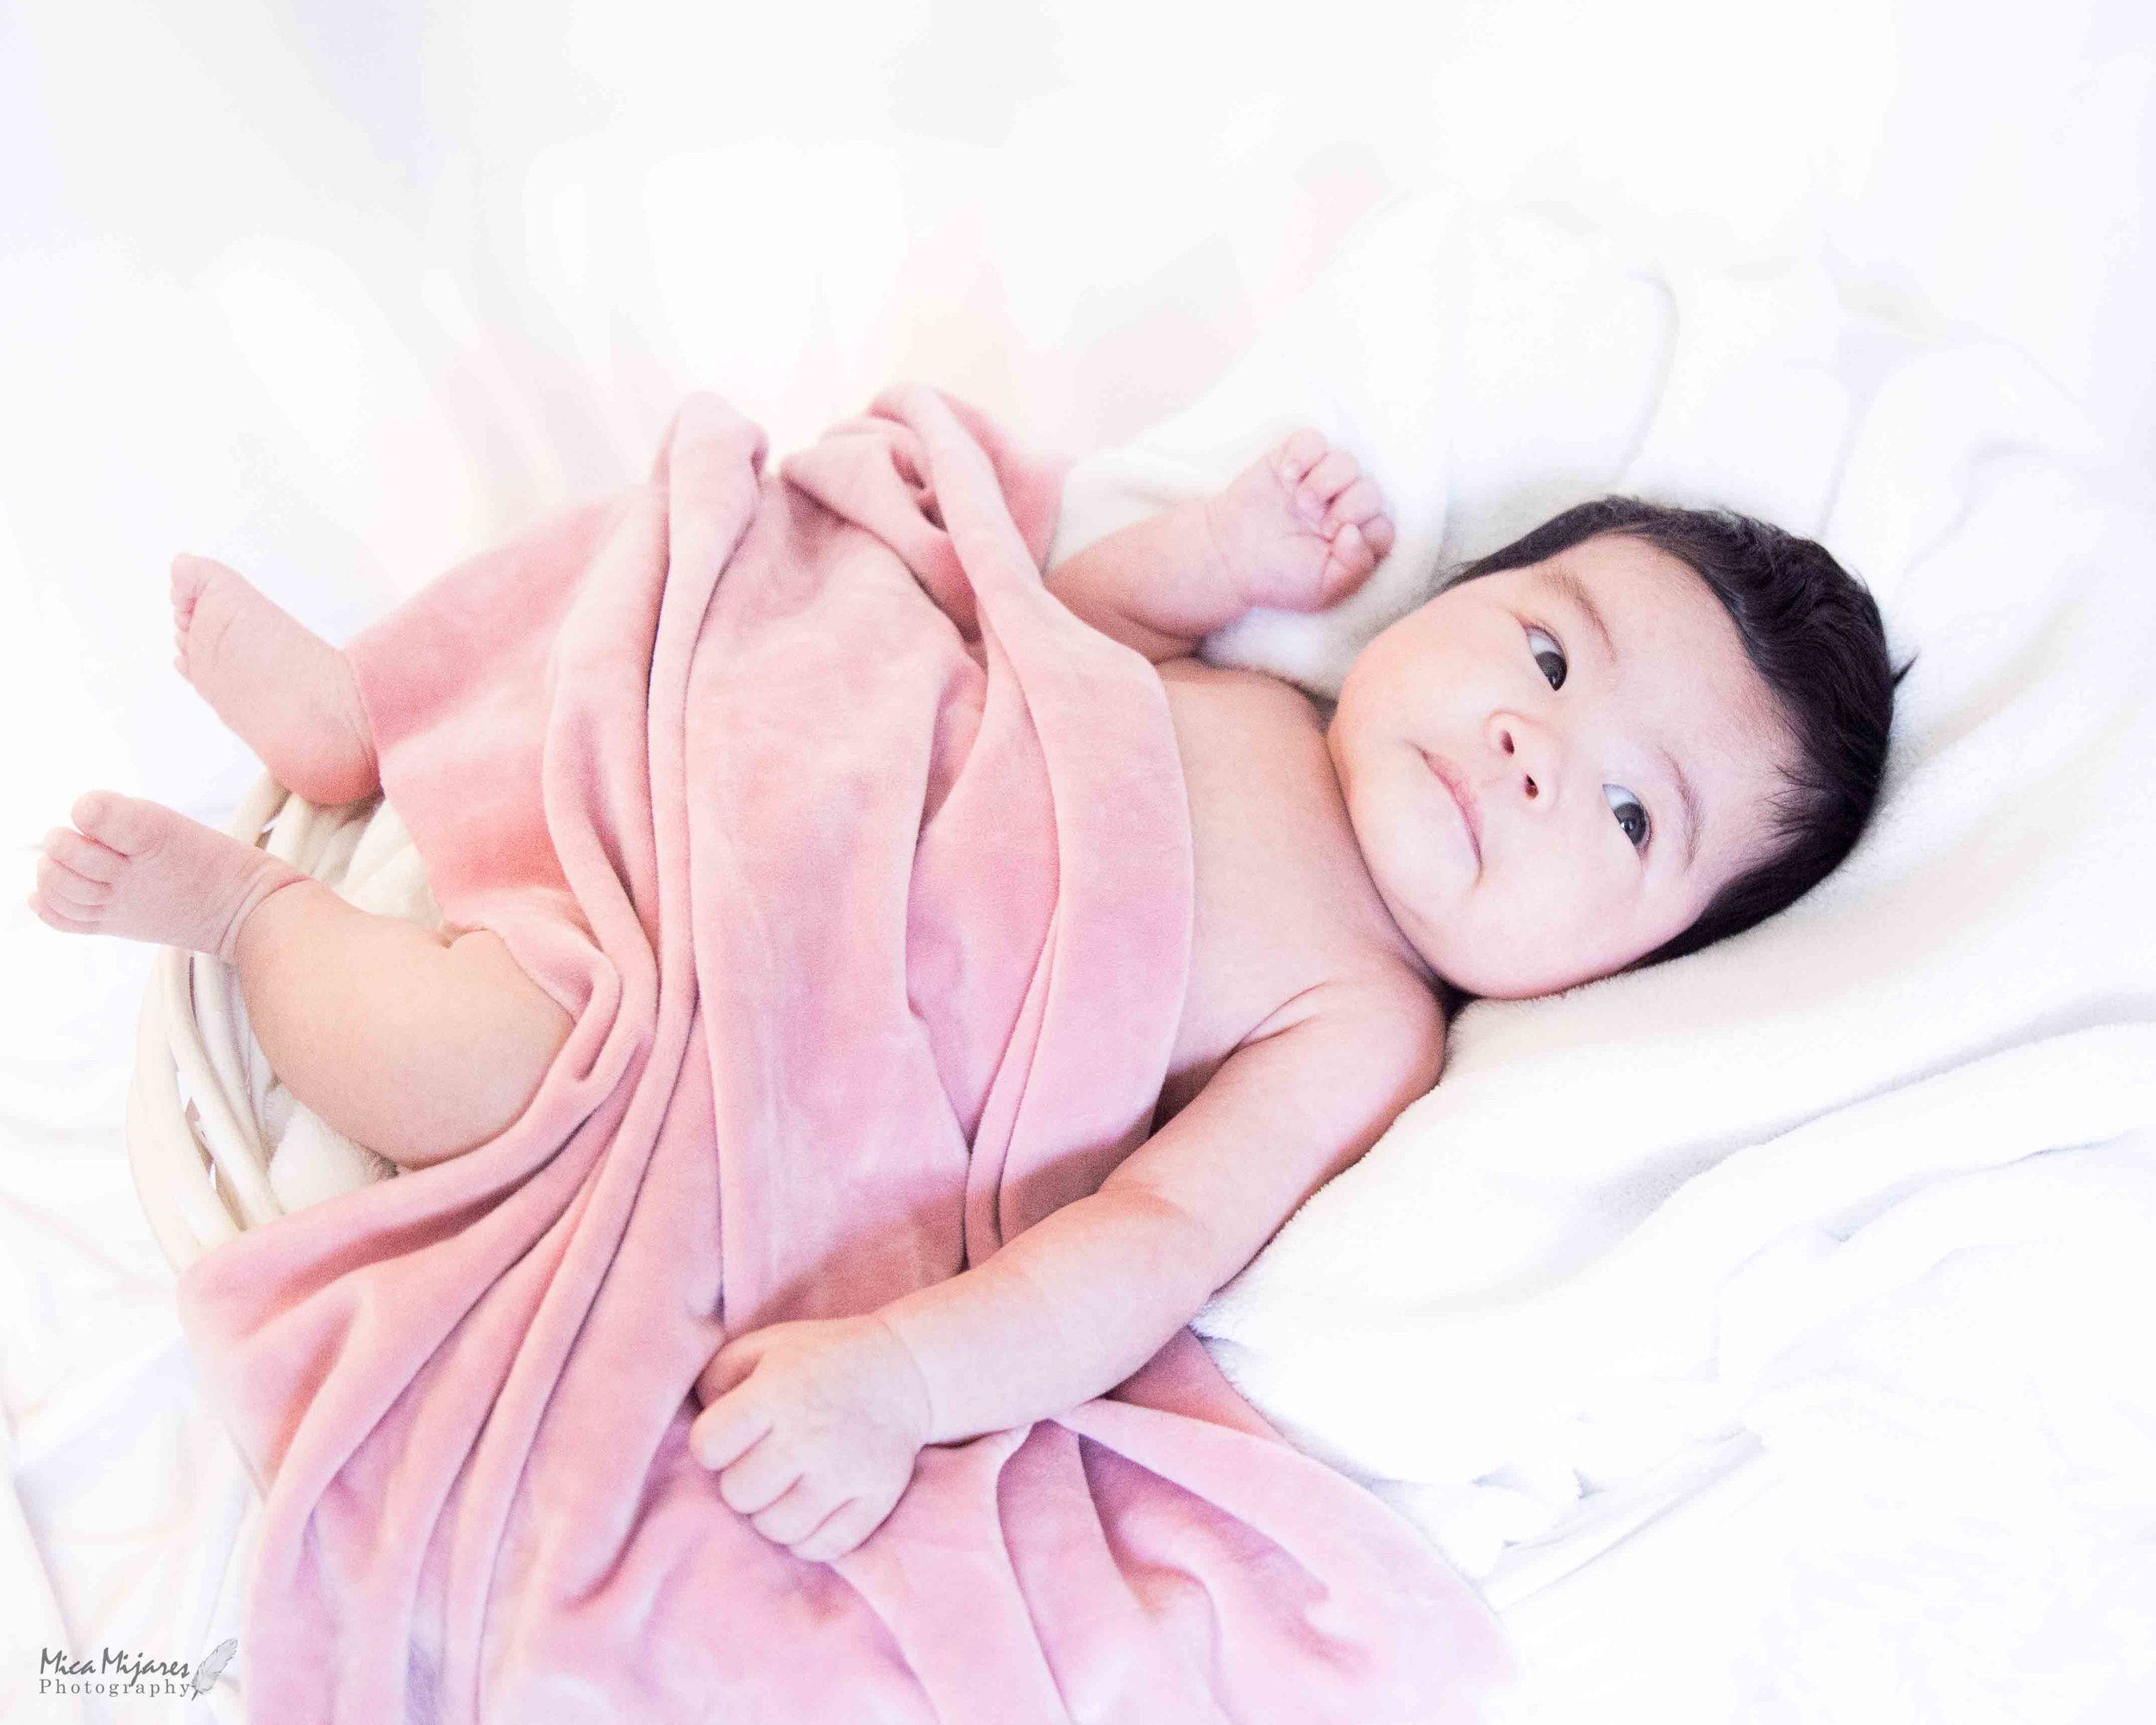 rileyfaith-BabyPhotography-MicaMijaresPhotography (5 of 27).jpg